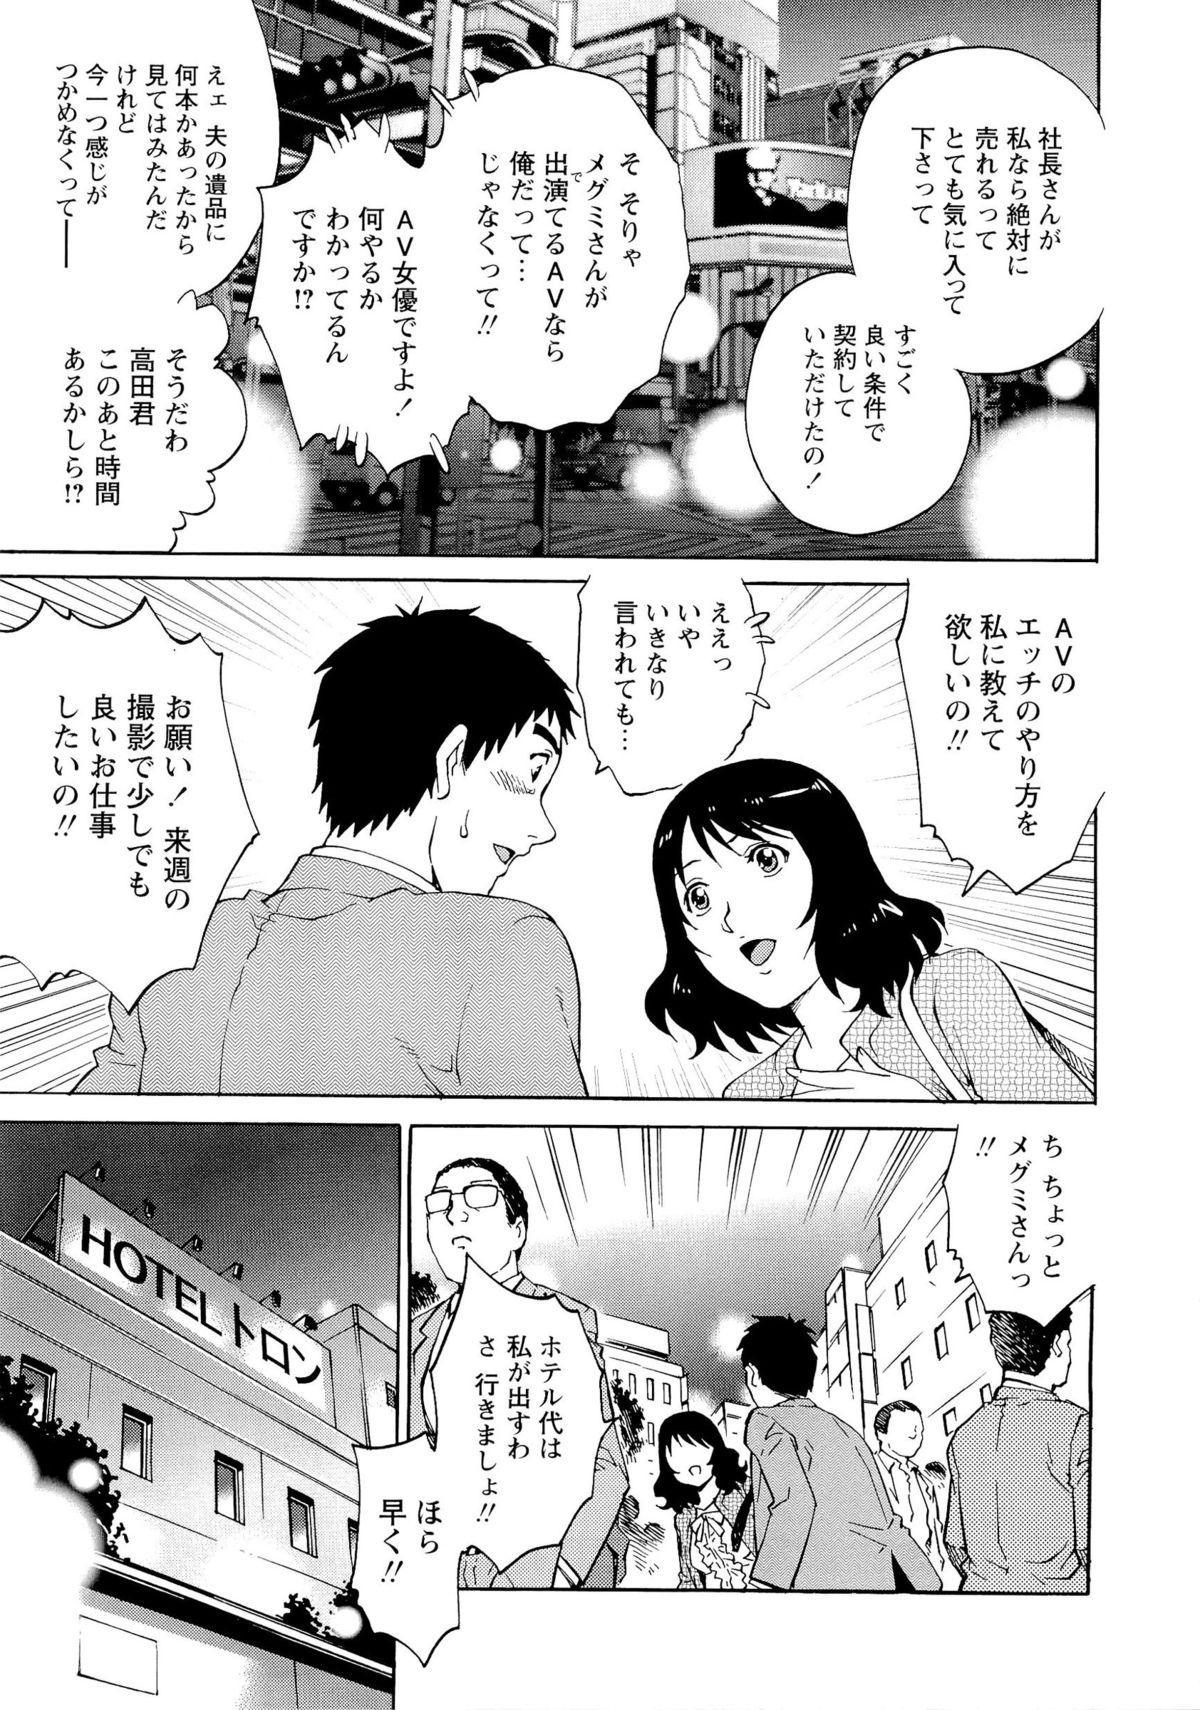 Nureteru Hitozuma - Wetly Wife 169